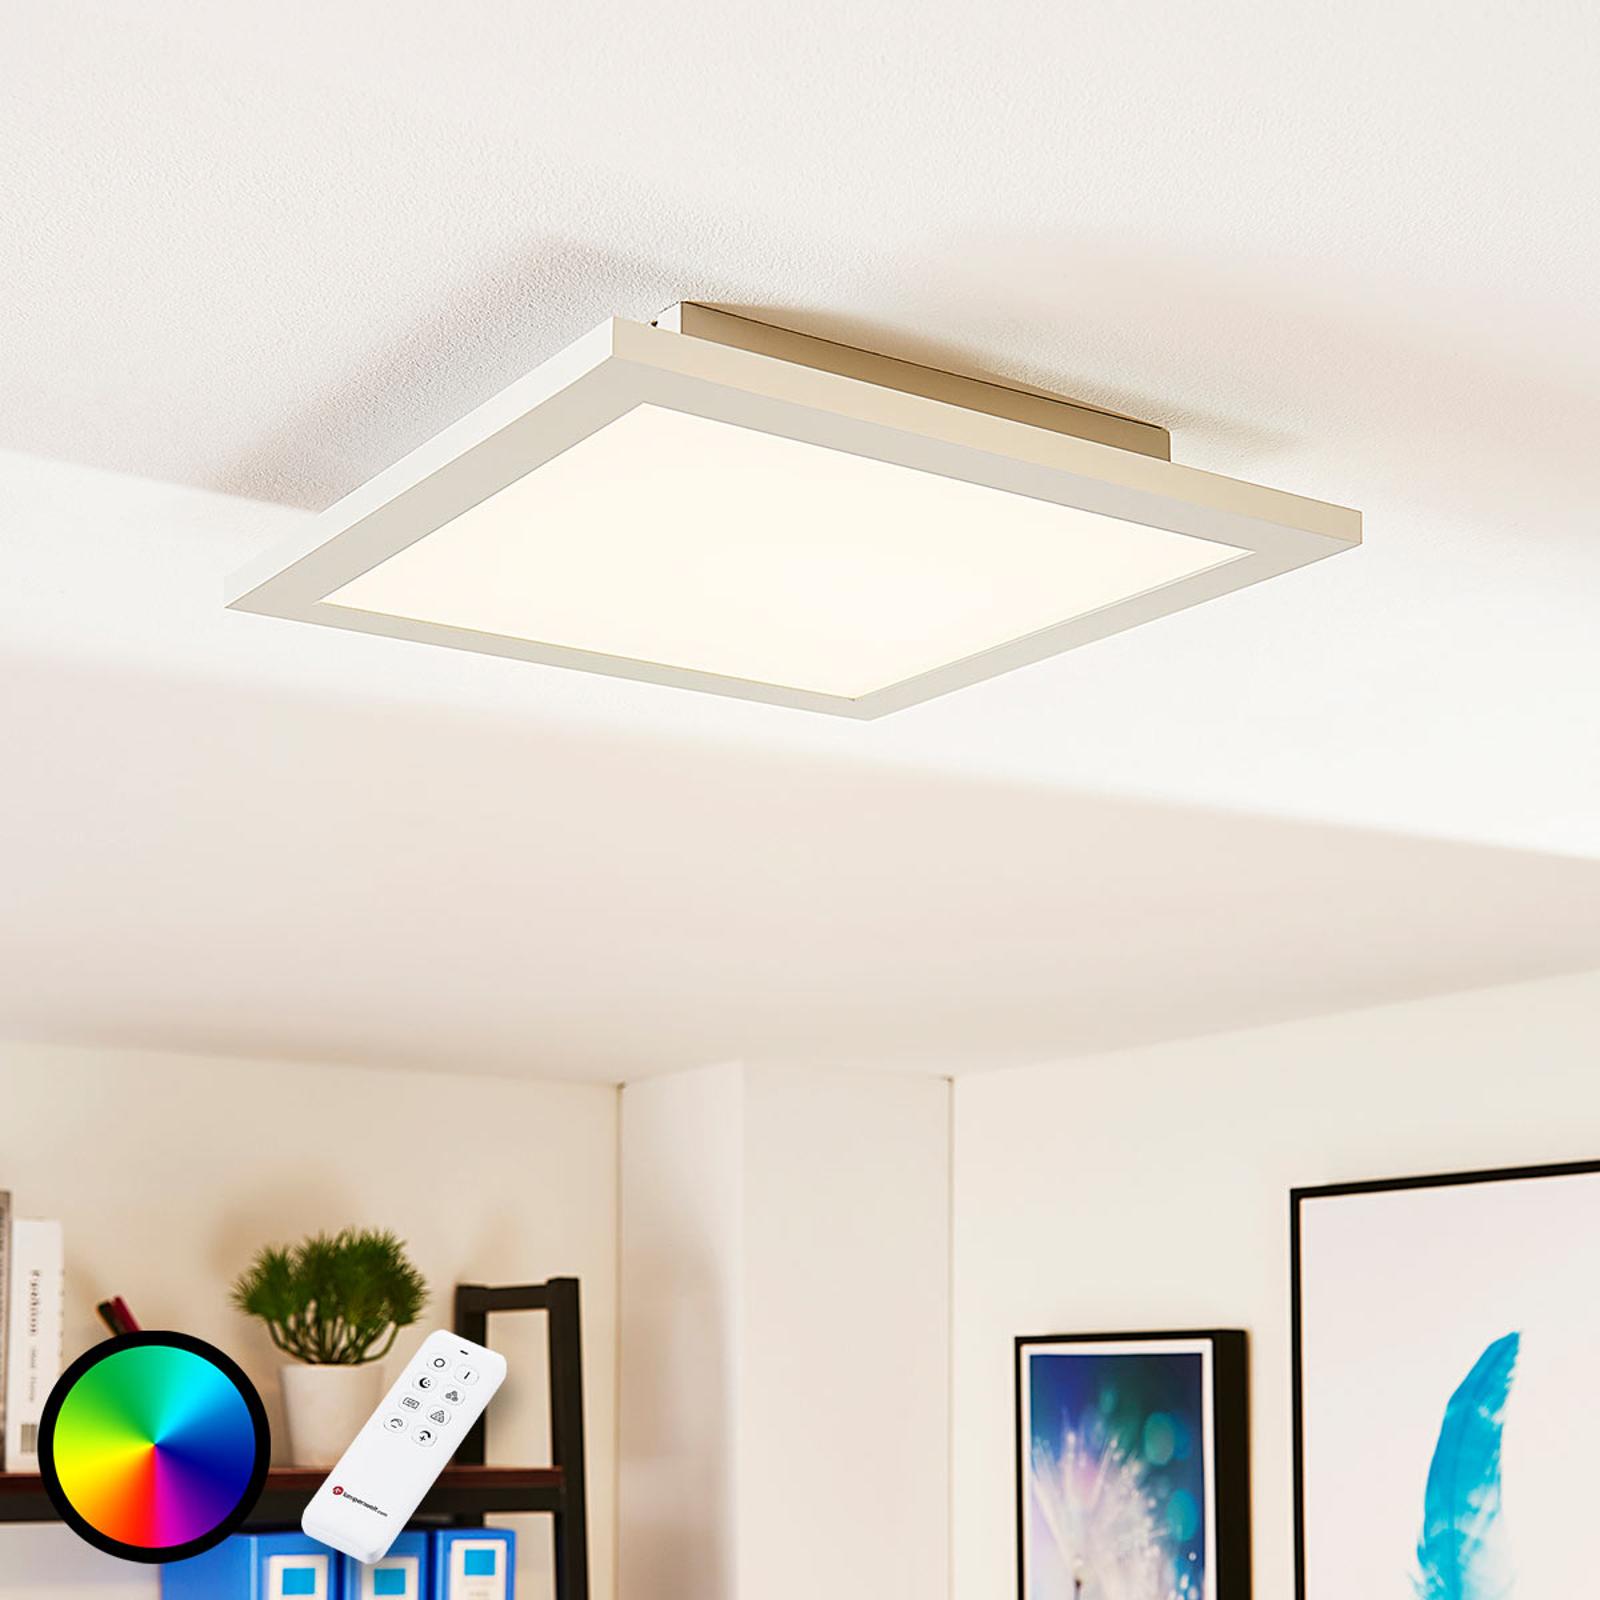 Kvadratisk LED-panel Tinus, RGB og varmhvit